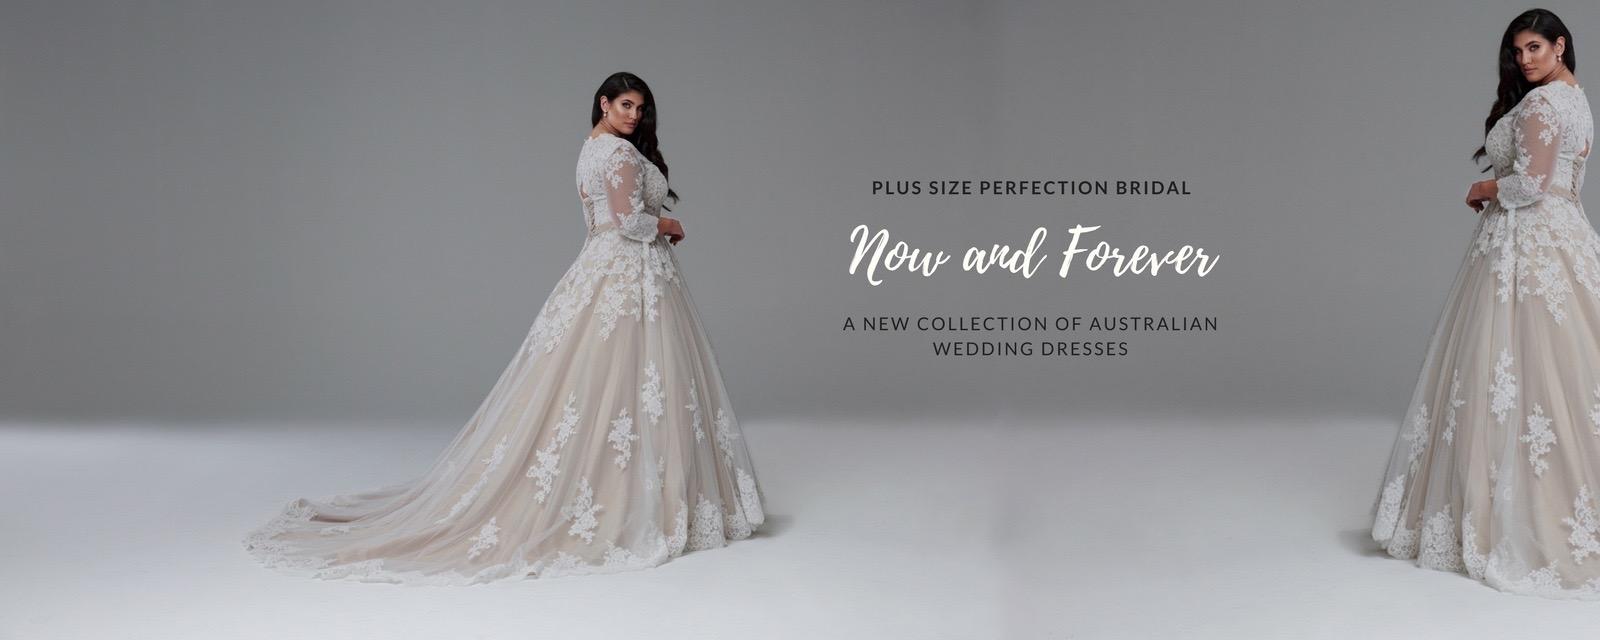 Long Sleeve Wedding Dresses Plus Size Bride Specialists